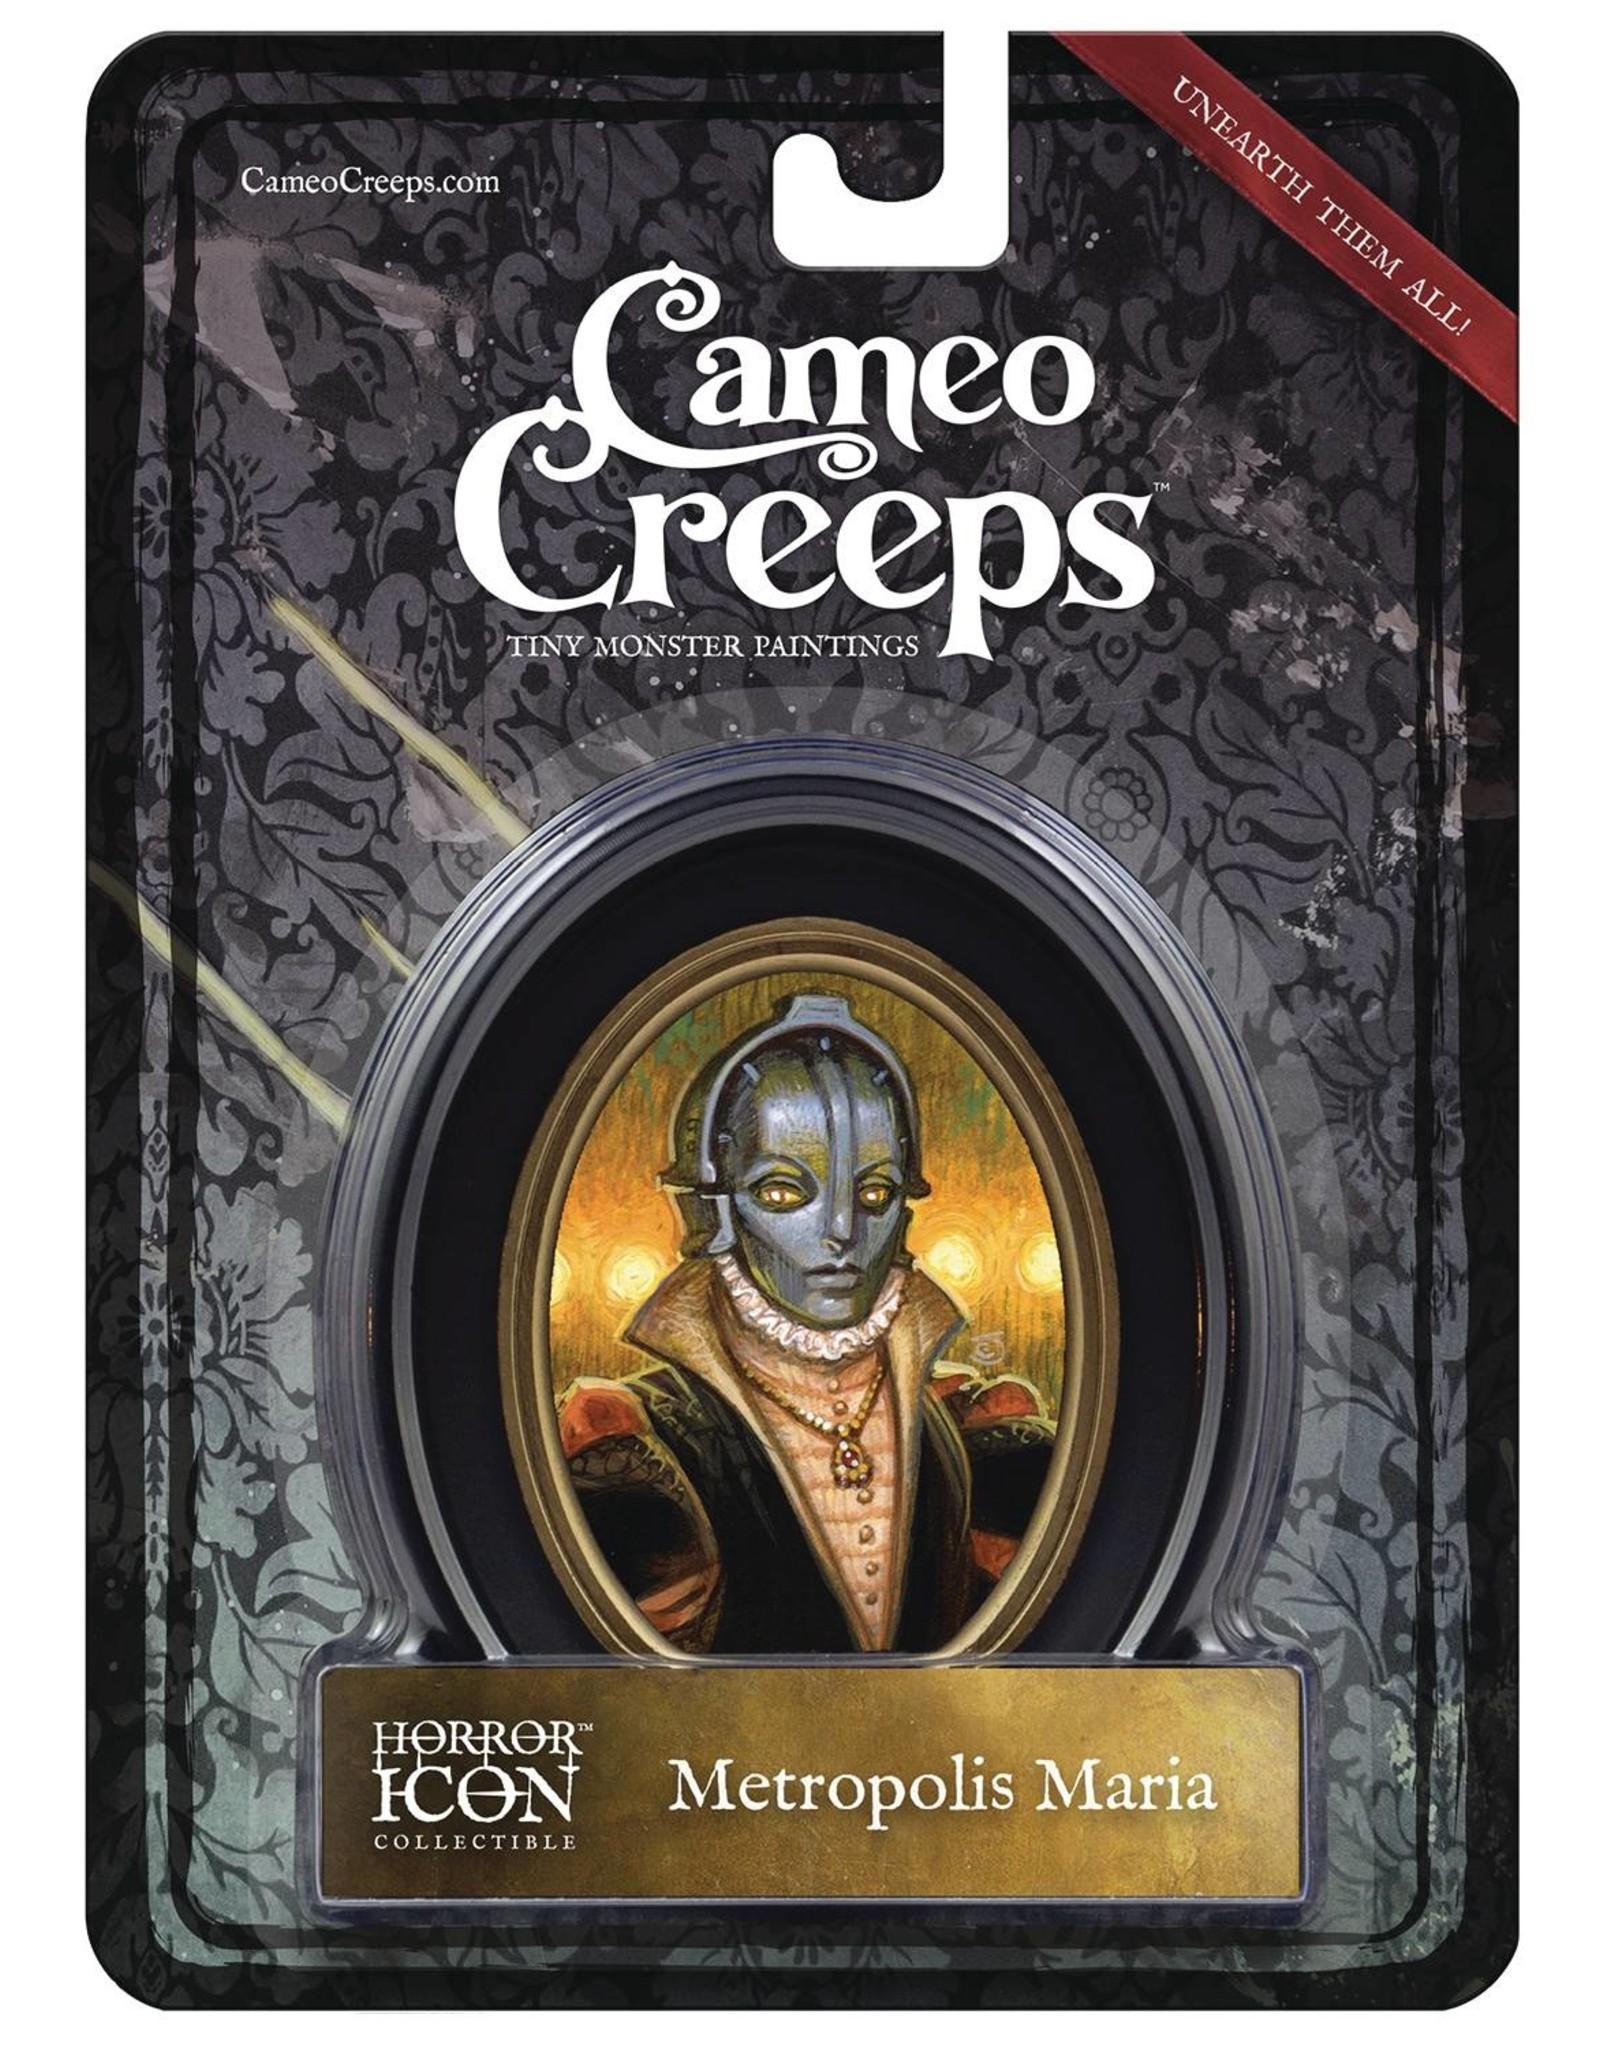 CAMEOCREEPS METROPOLIS MARIA MINI CAMEO PORTRAIT